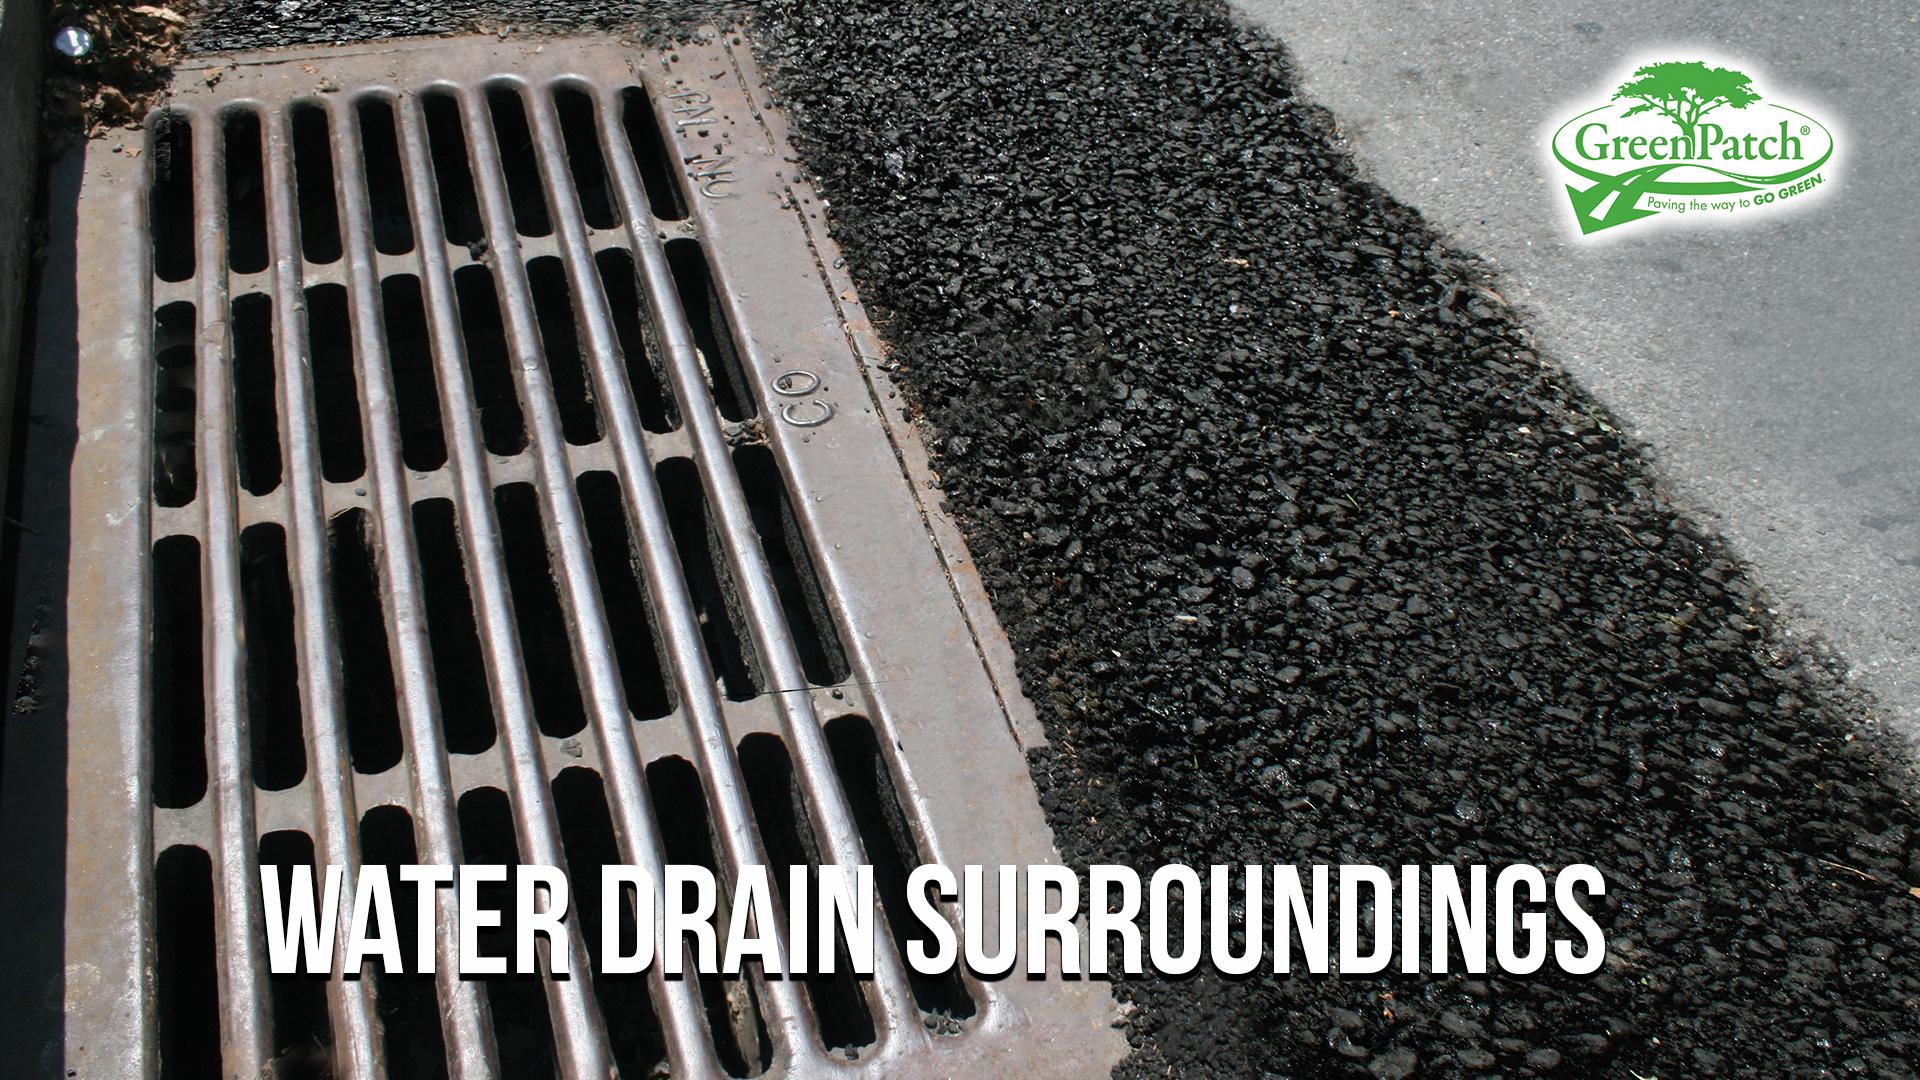 water drain surroundings.jpg